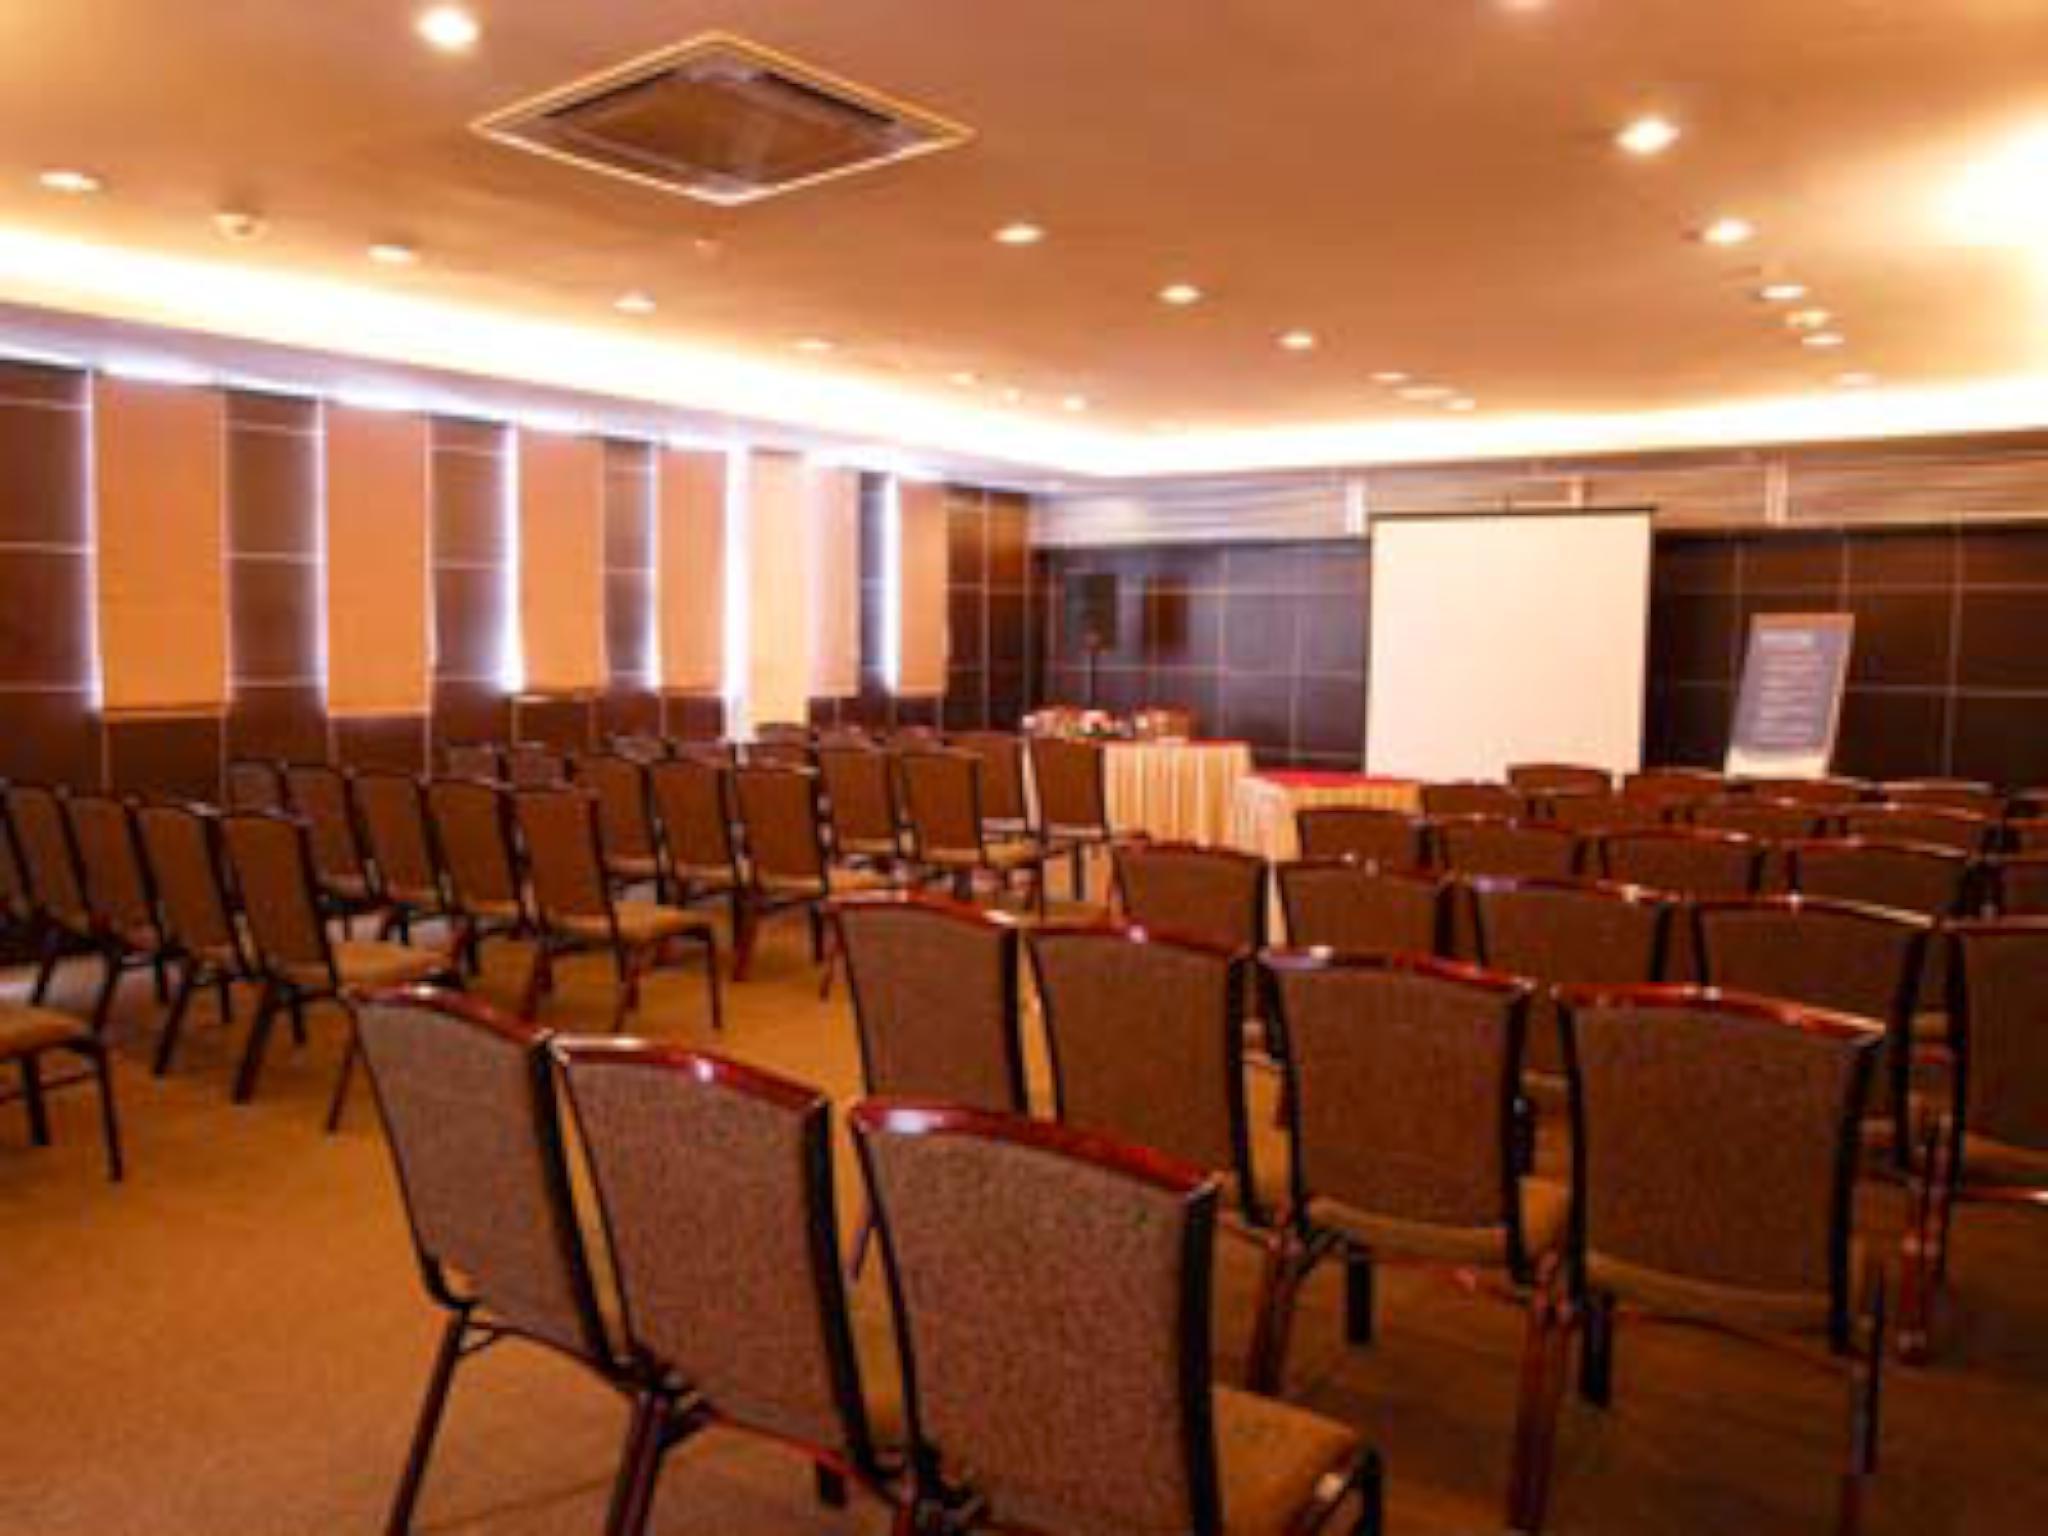 Aston Braga Hotel & Residence Bandung - Bandung Indonesia Hotels - Hotel reservations for Hotels ...